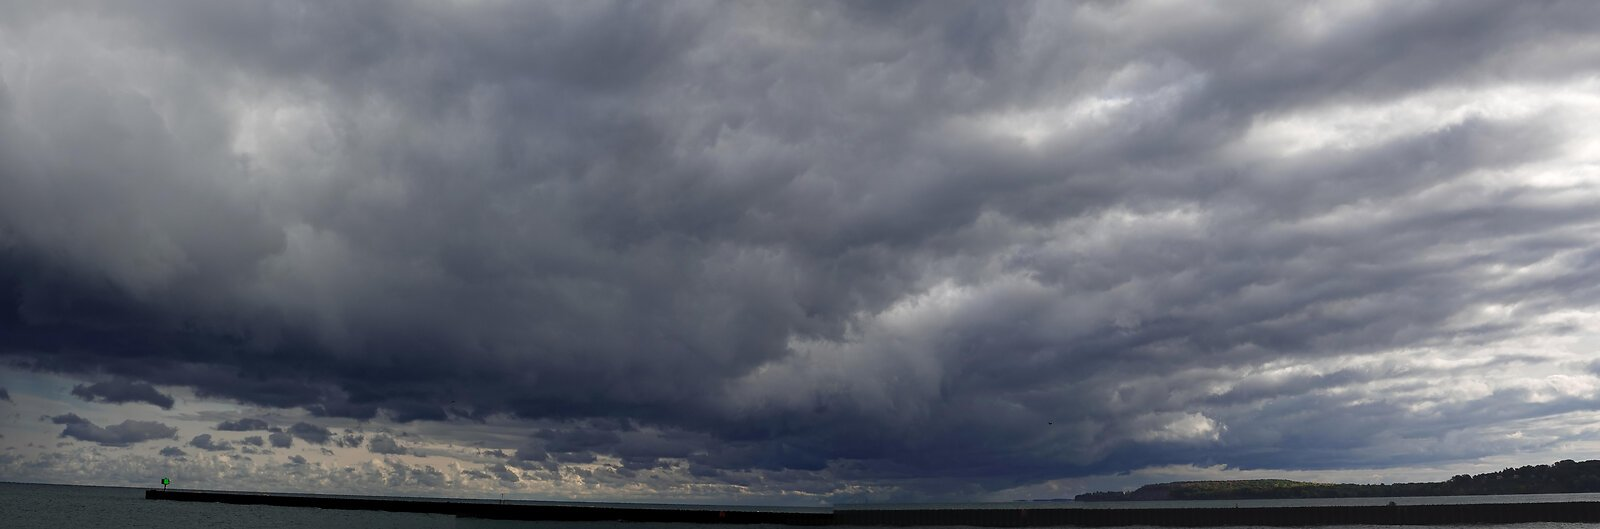 RX10 Lake Ontario Chimney Bluffs 058_stitch.jpg